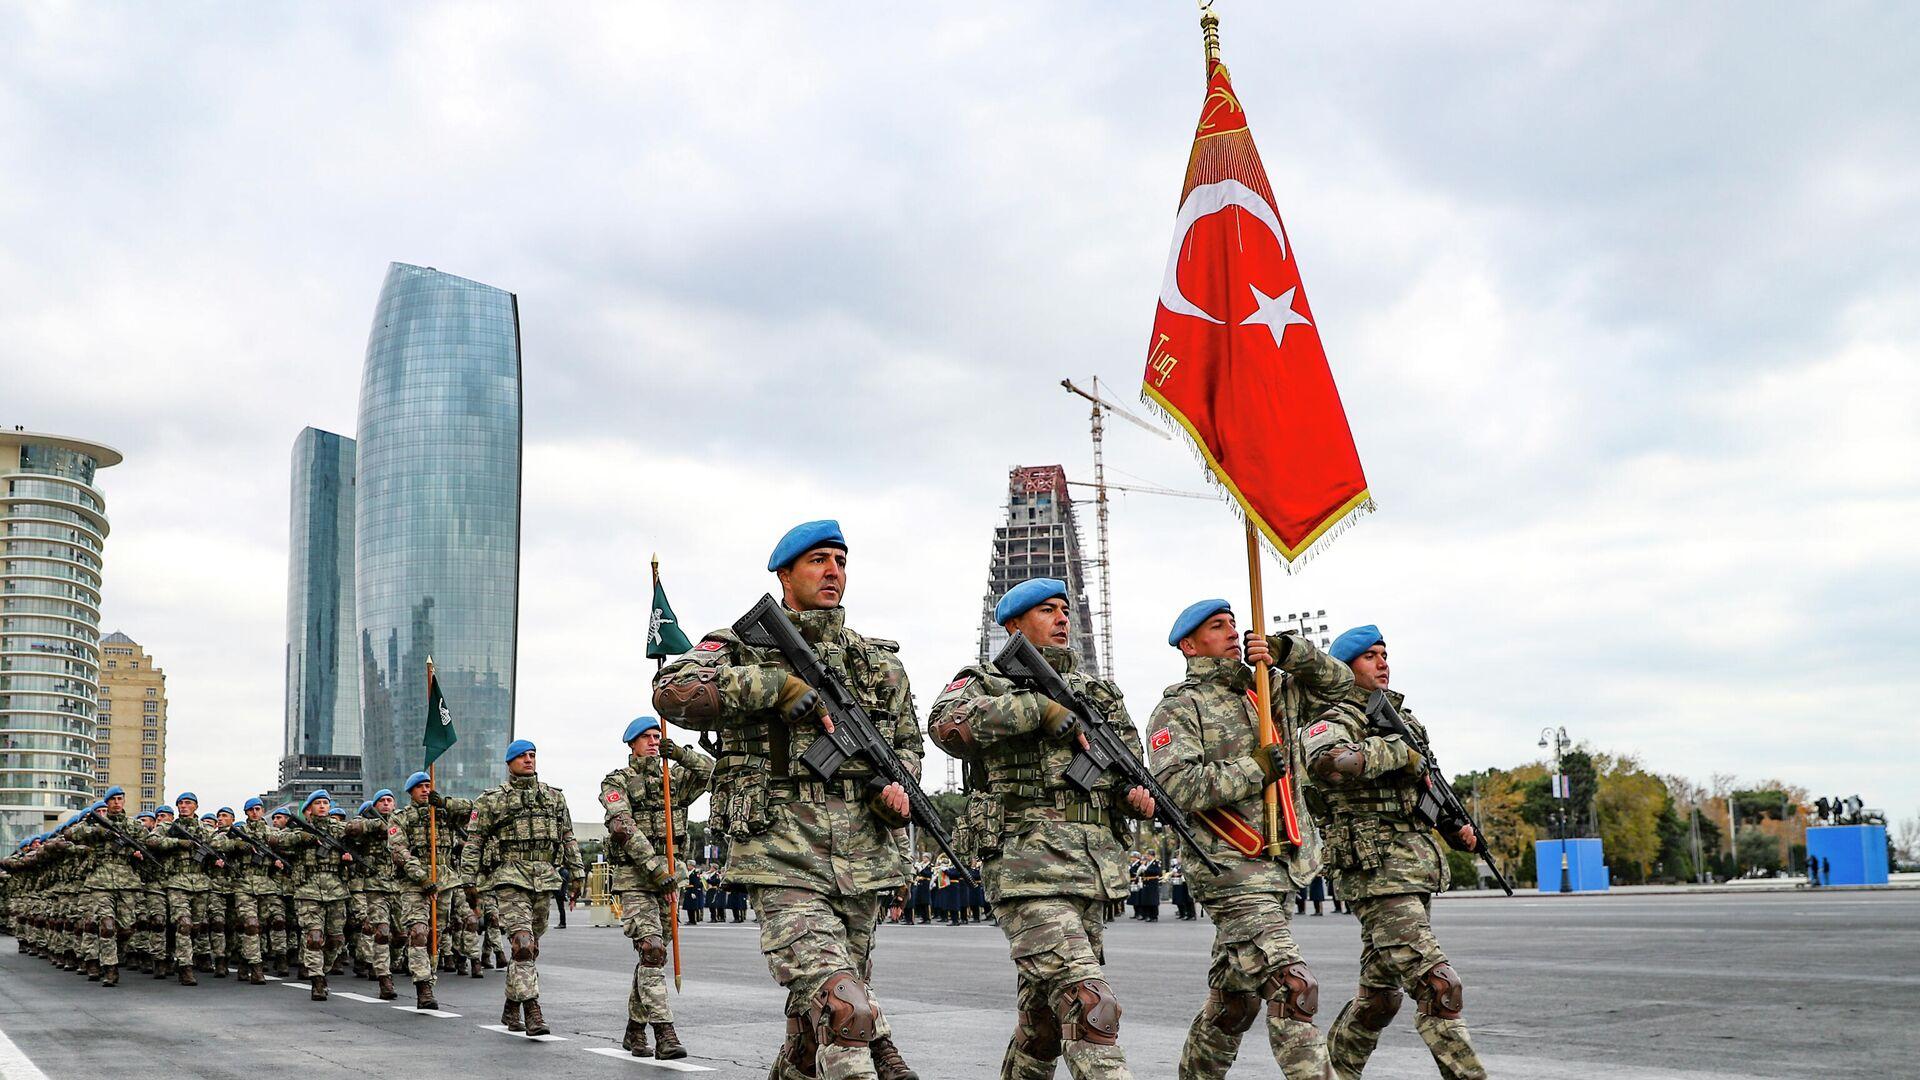 Soldados turcos en Azerbaiyán - Sputnik Mundo, 1920, 18.02.2021